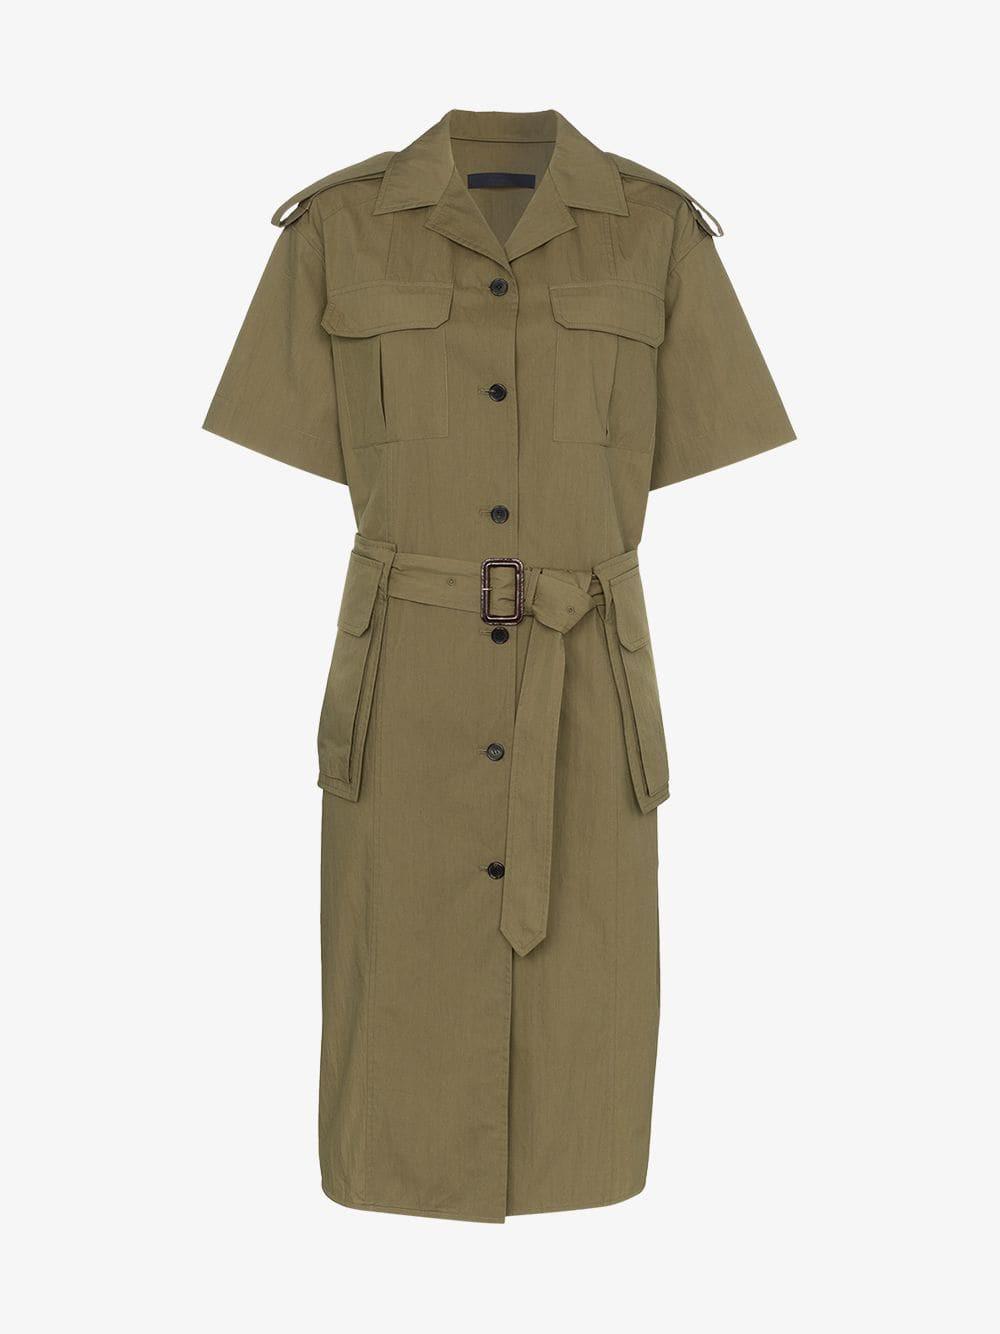 Juun.J belted midi cotton blend shirt dress in khaki